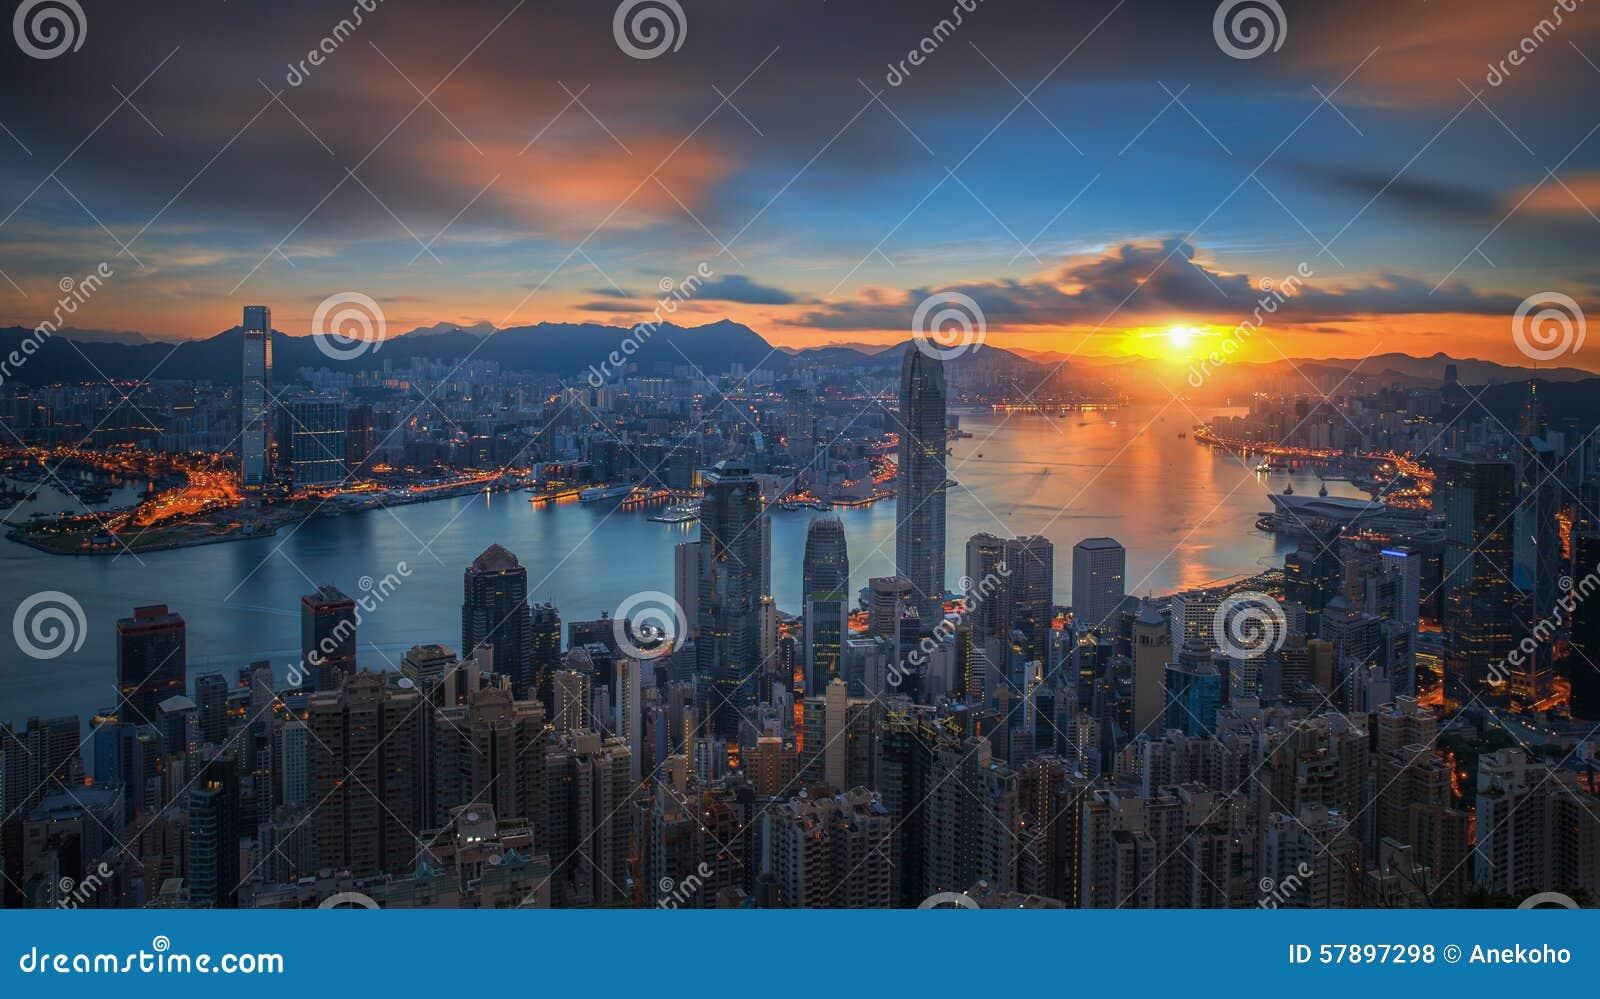 Download Sunrise Over Victoria Harbor As Viewed Atop Victoria Peak Stock Photo - Image of cityscape, harbor: 57897298